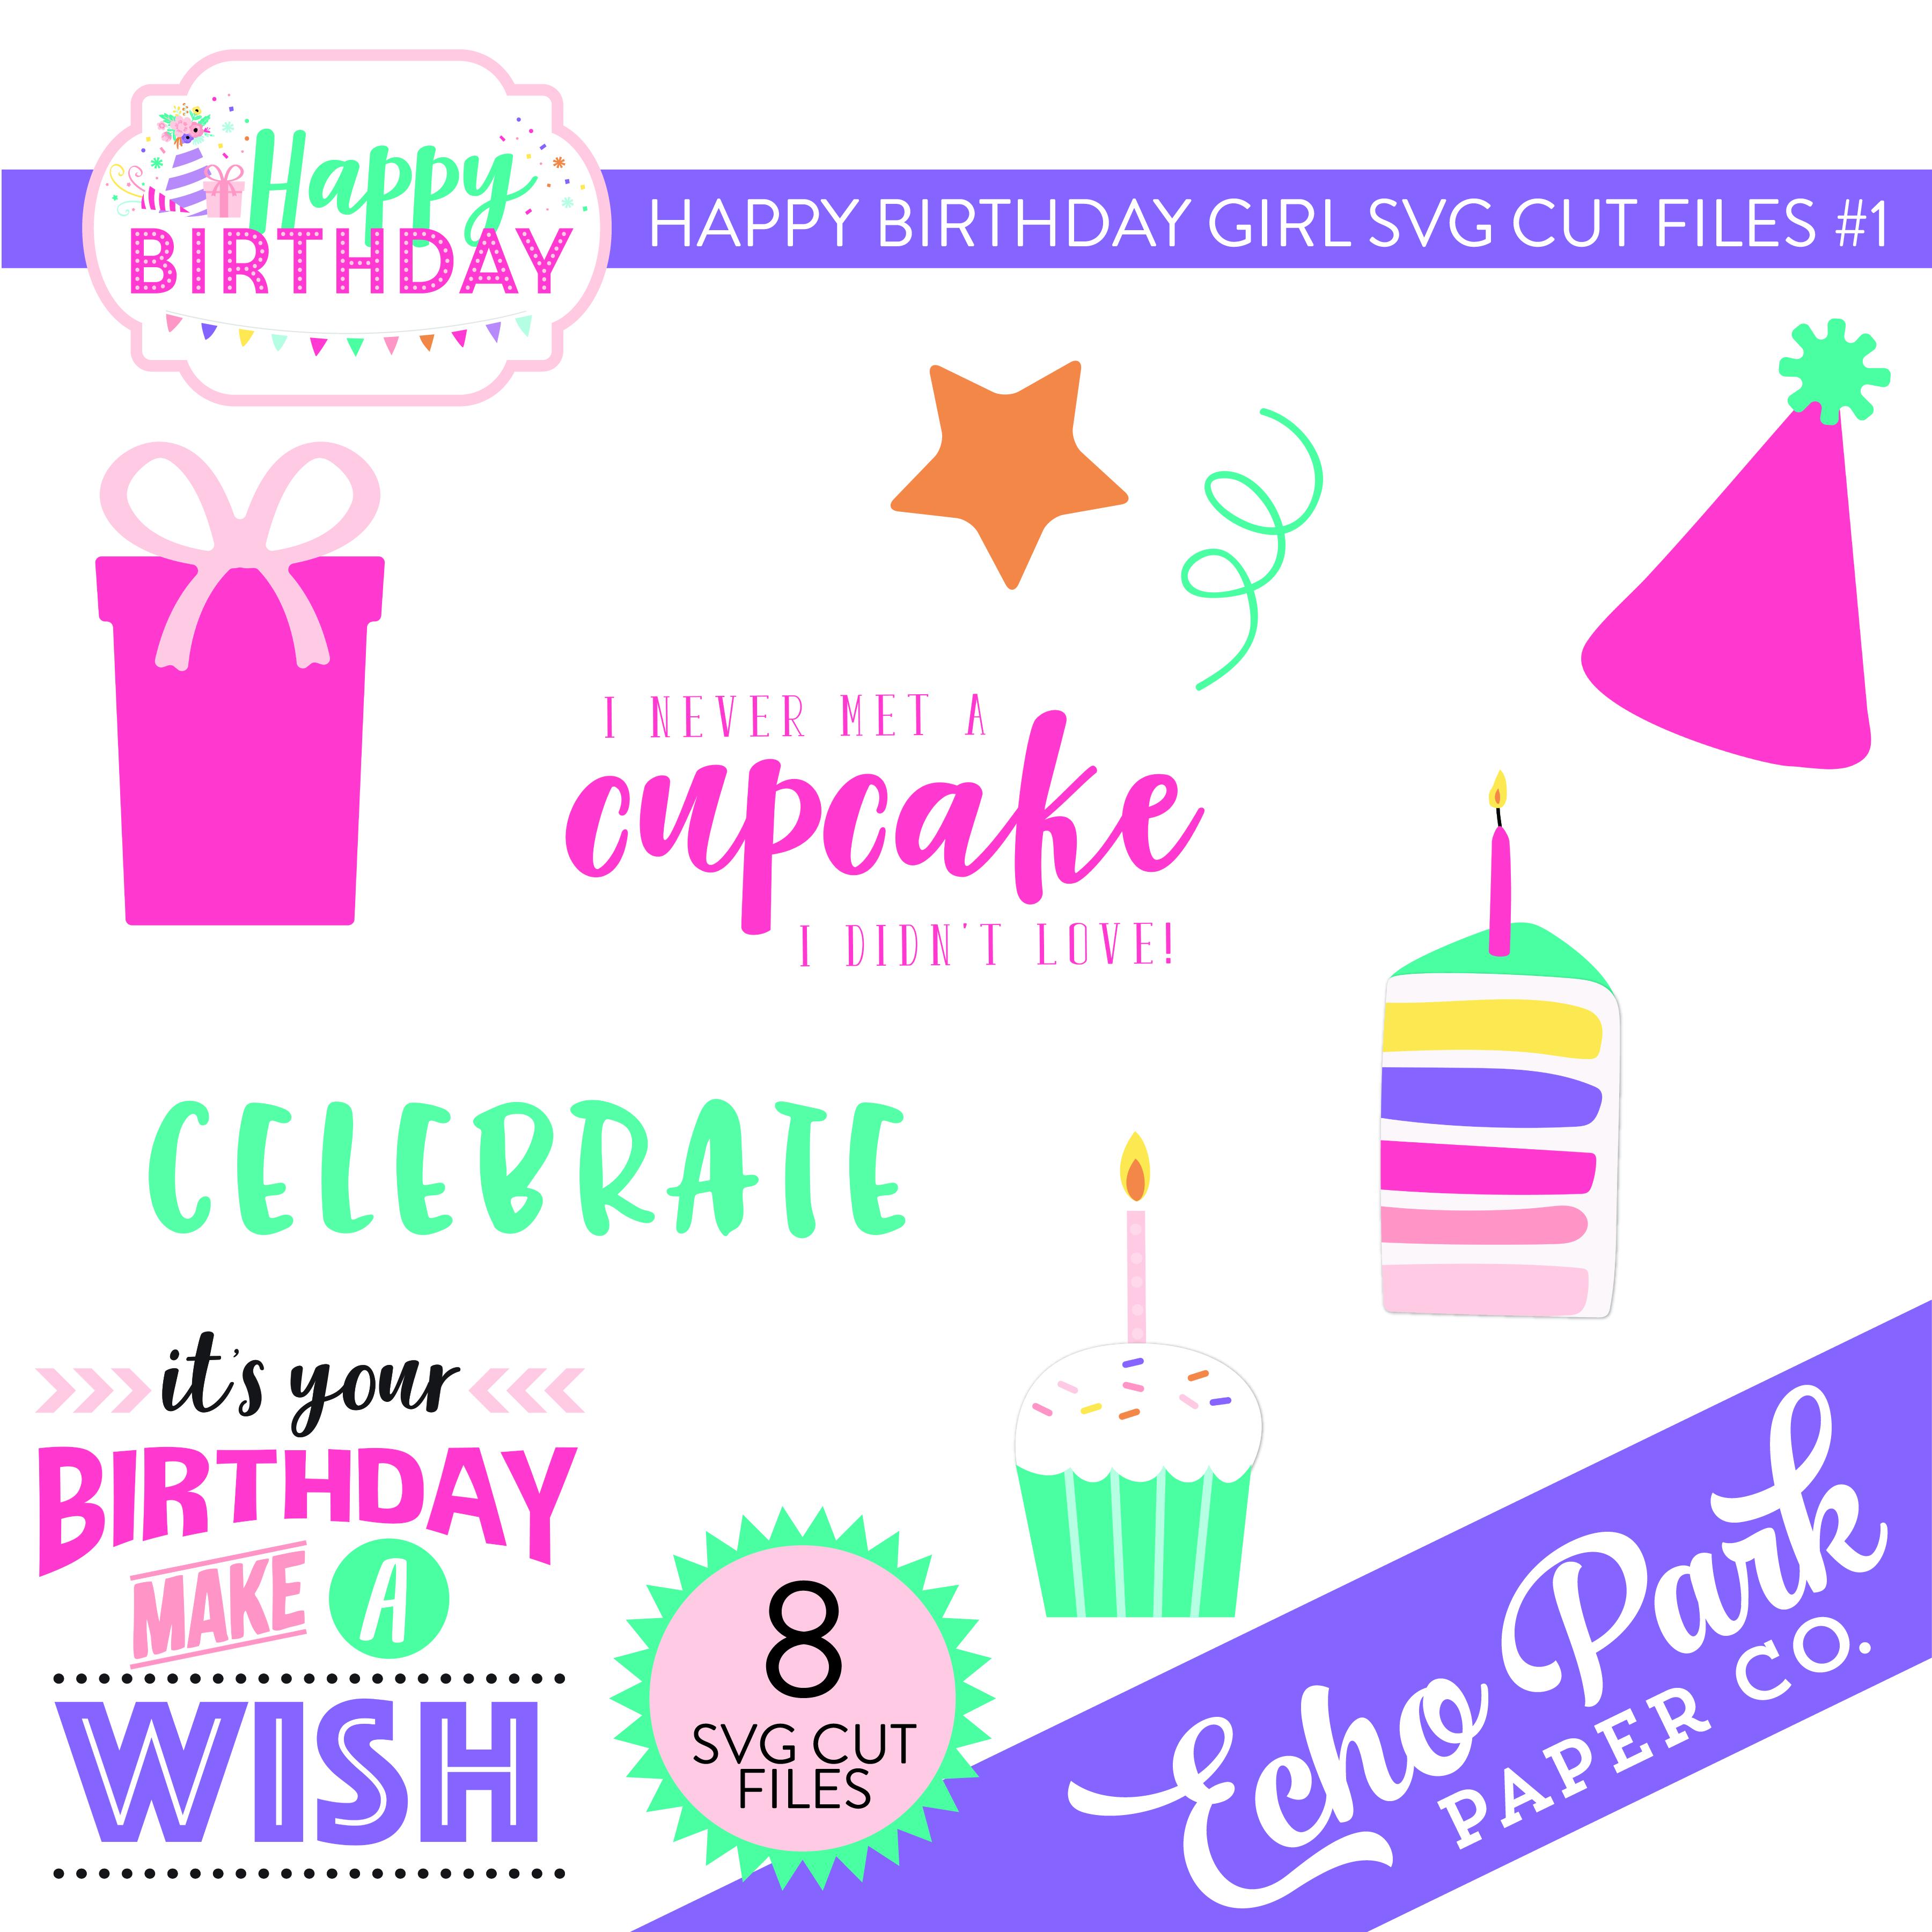 Happy Birthday Girl SVG Cut Files #1